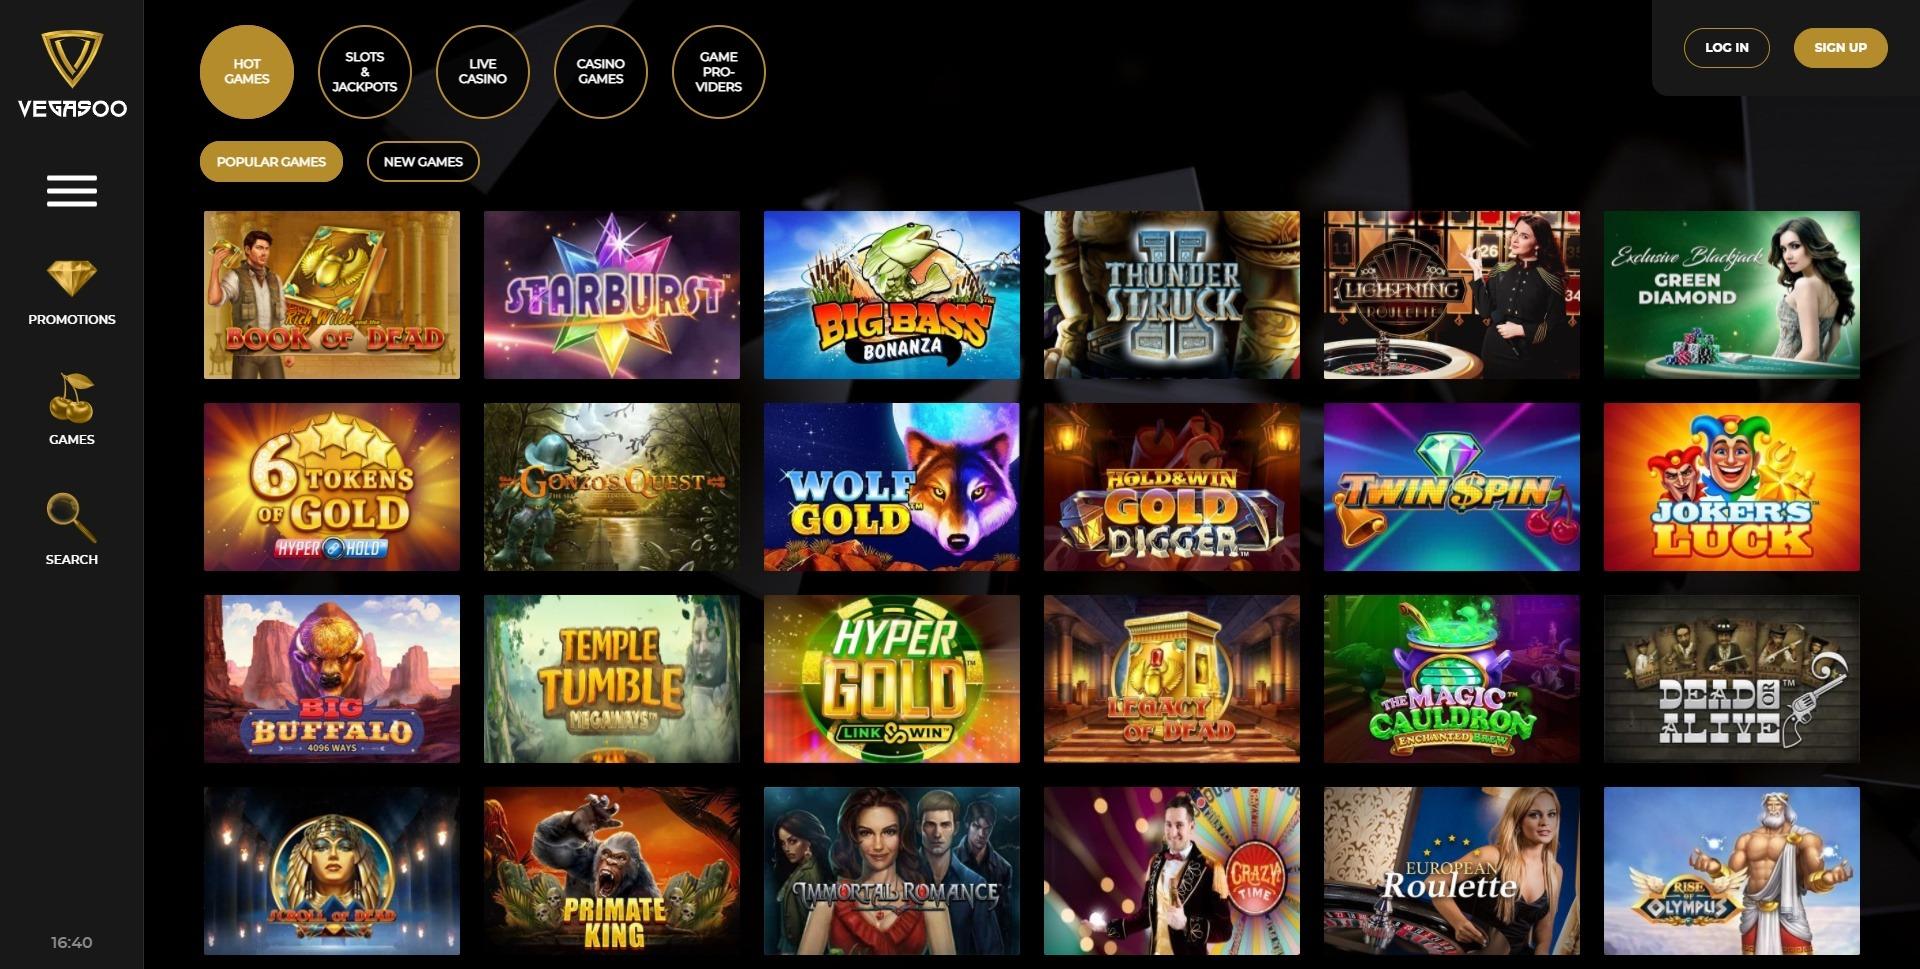 vegasoo casino games